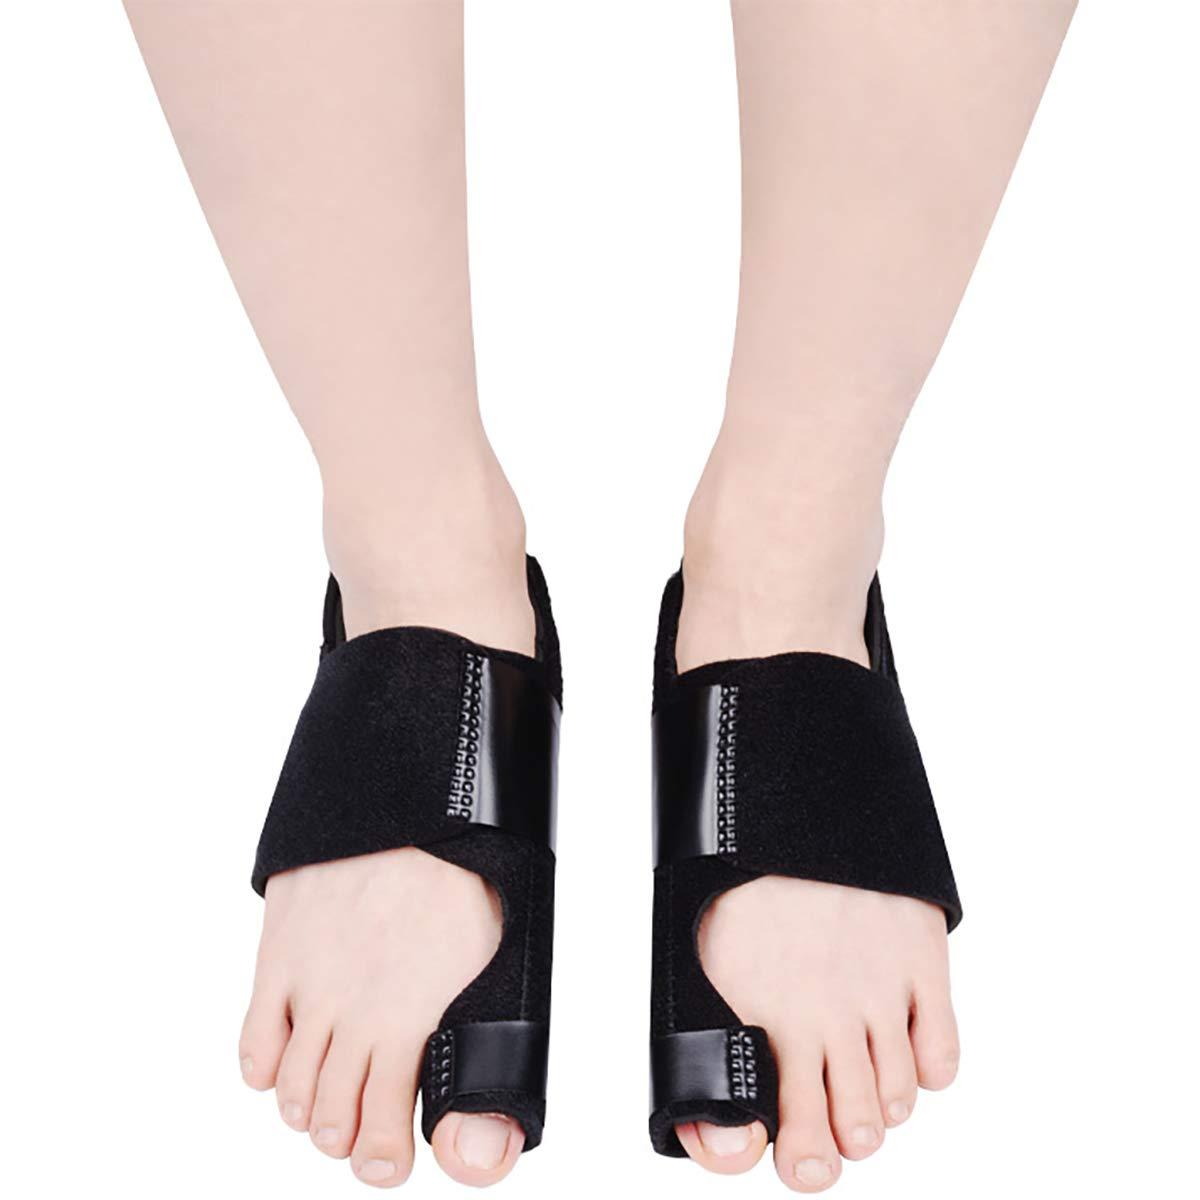 Hedume 2 Pack Bunion Corrector with Orthopedic Bunion Splint, Hallux Valgus Correction, Big Toe Straightener, Big Toe Separator Pain Relief, Day Night Support: Industrial & Scientific